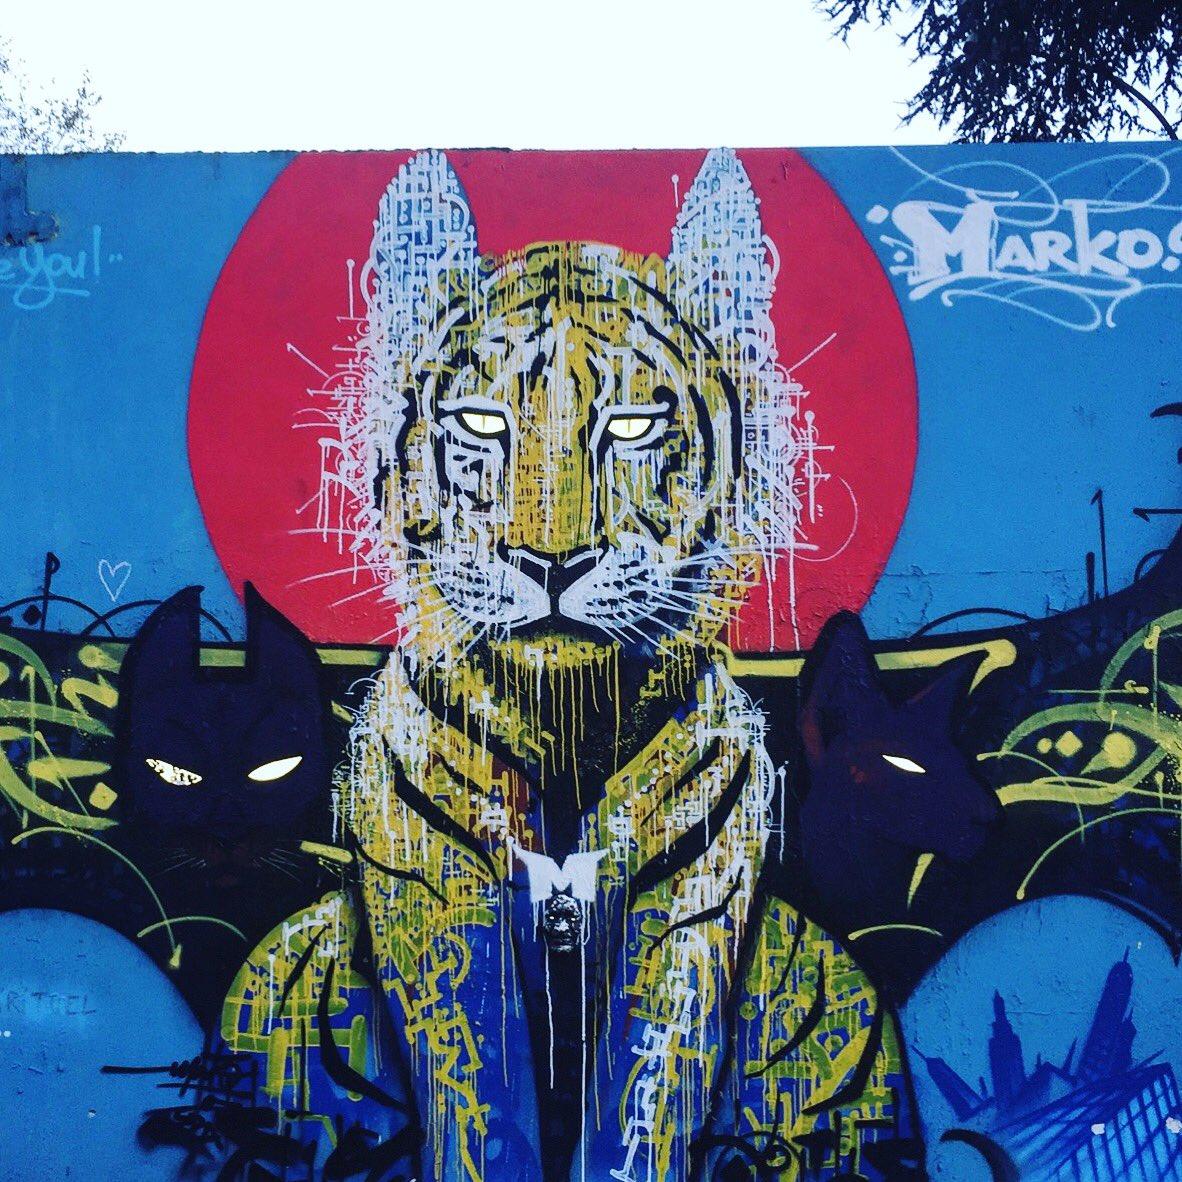 The eyes of the Tiger by @Marko93 #marko93 #darkvapor #calligraphy #tiger #eyes  #streetart #graff #spray #bombing #wall #urbanart #graffart<br>http://pic.twitter.com/3RV2mNxLTT